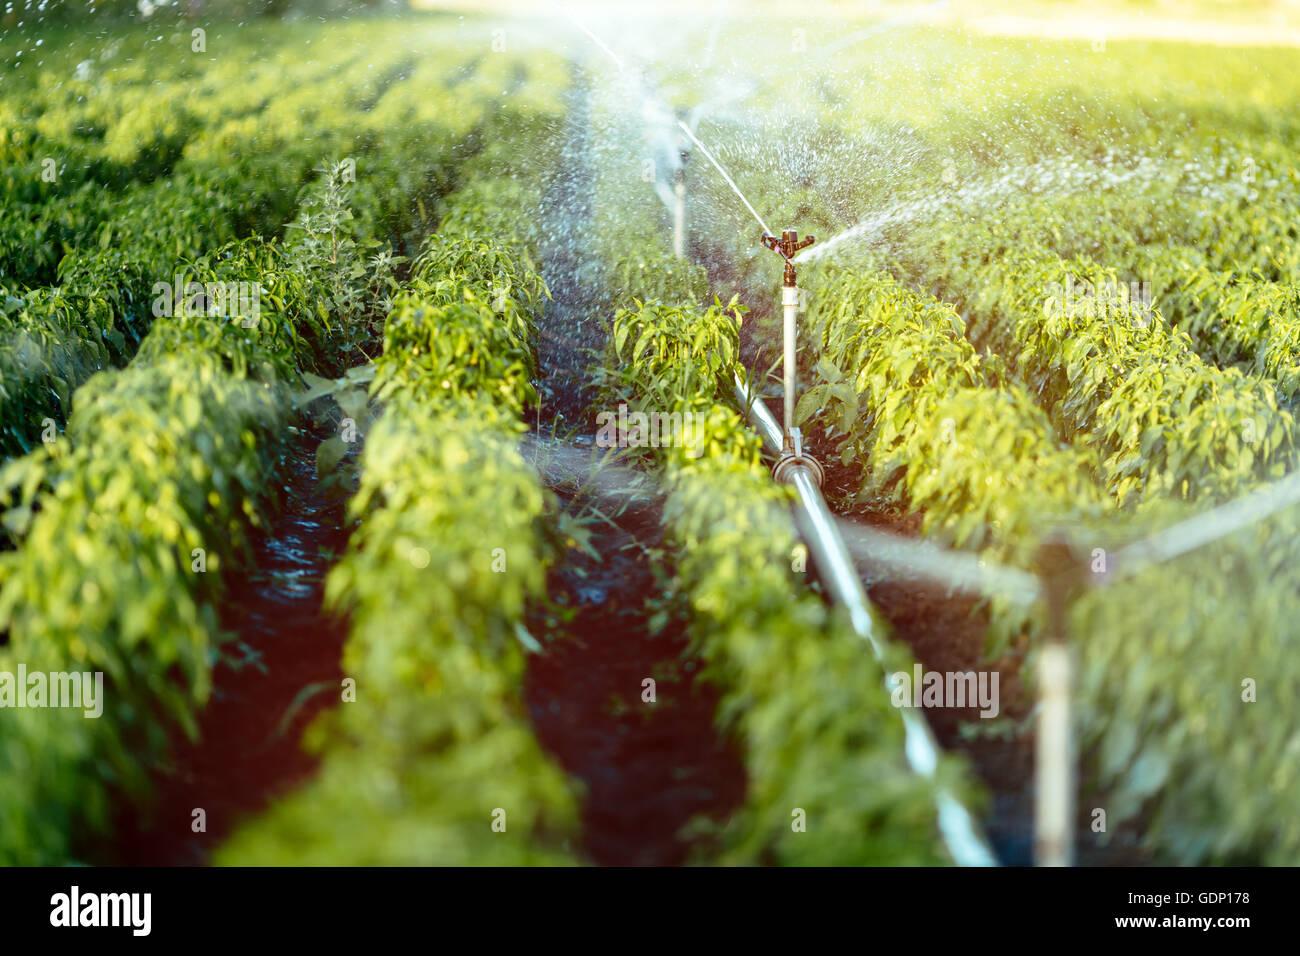 Sistema de riego en función de plantas agrícolas de riego Imagen De Stock